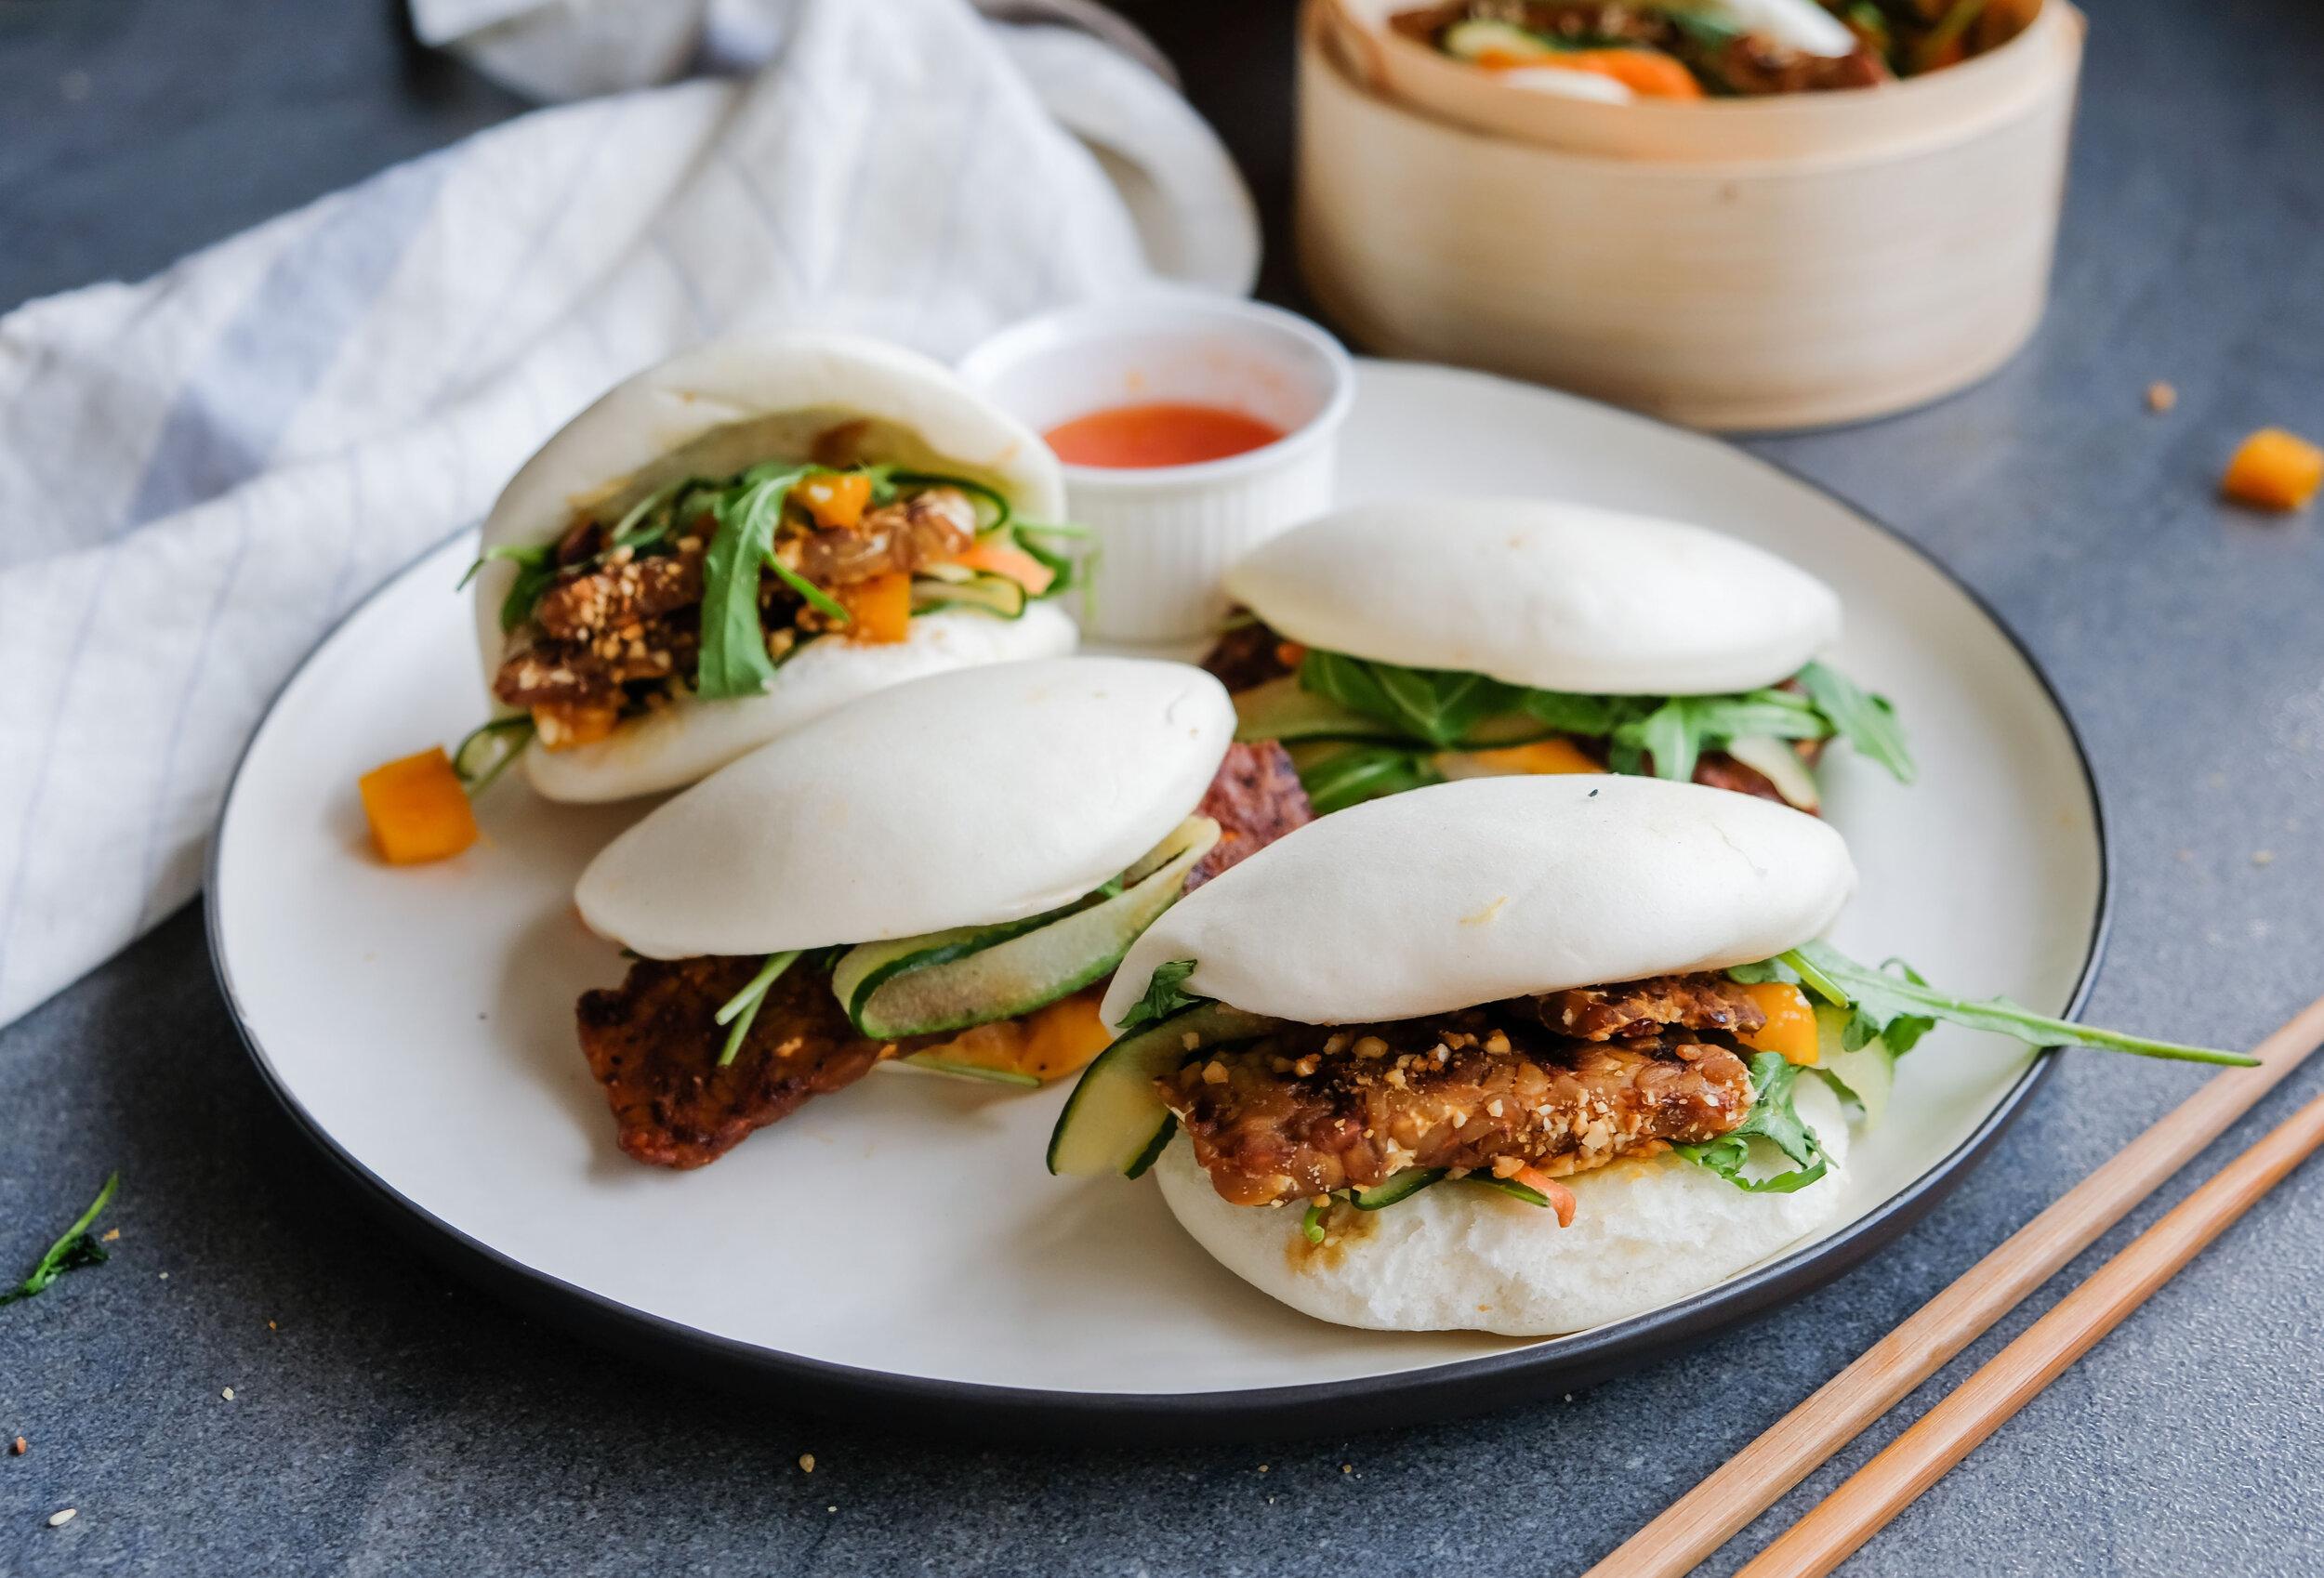 Tempeh bao buns… mmm anyone else hungry?